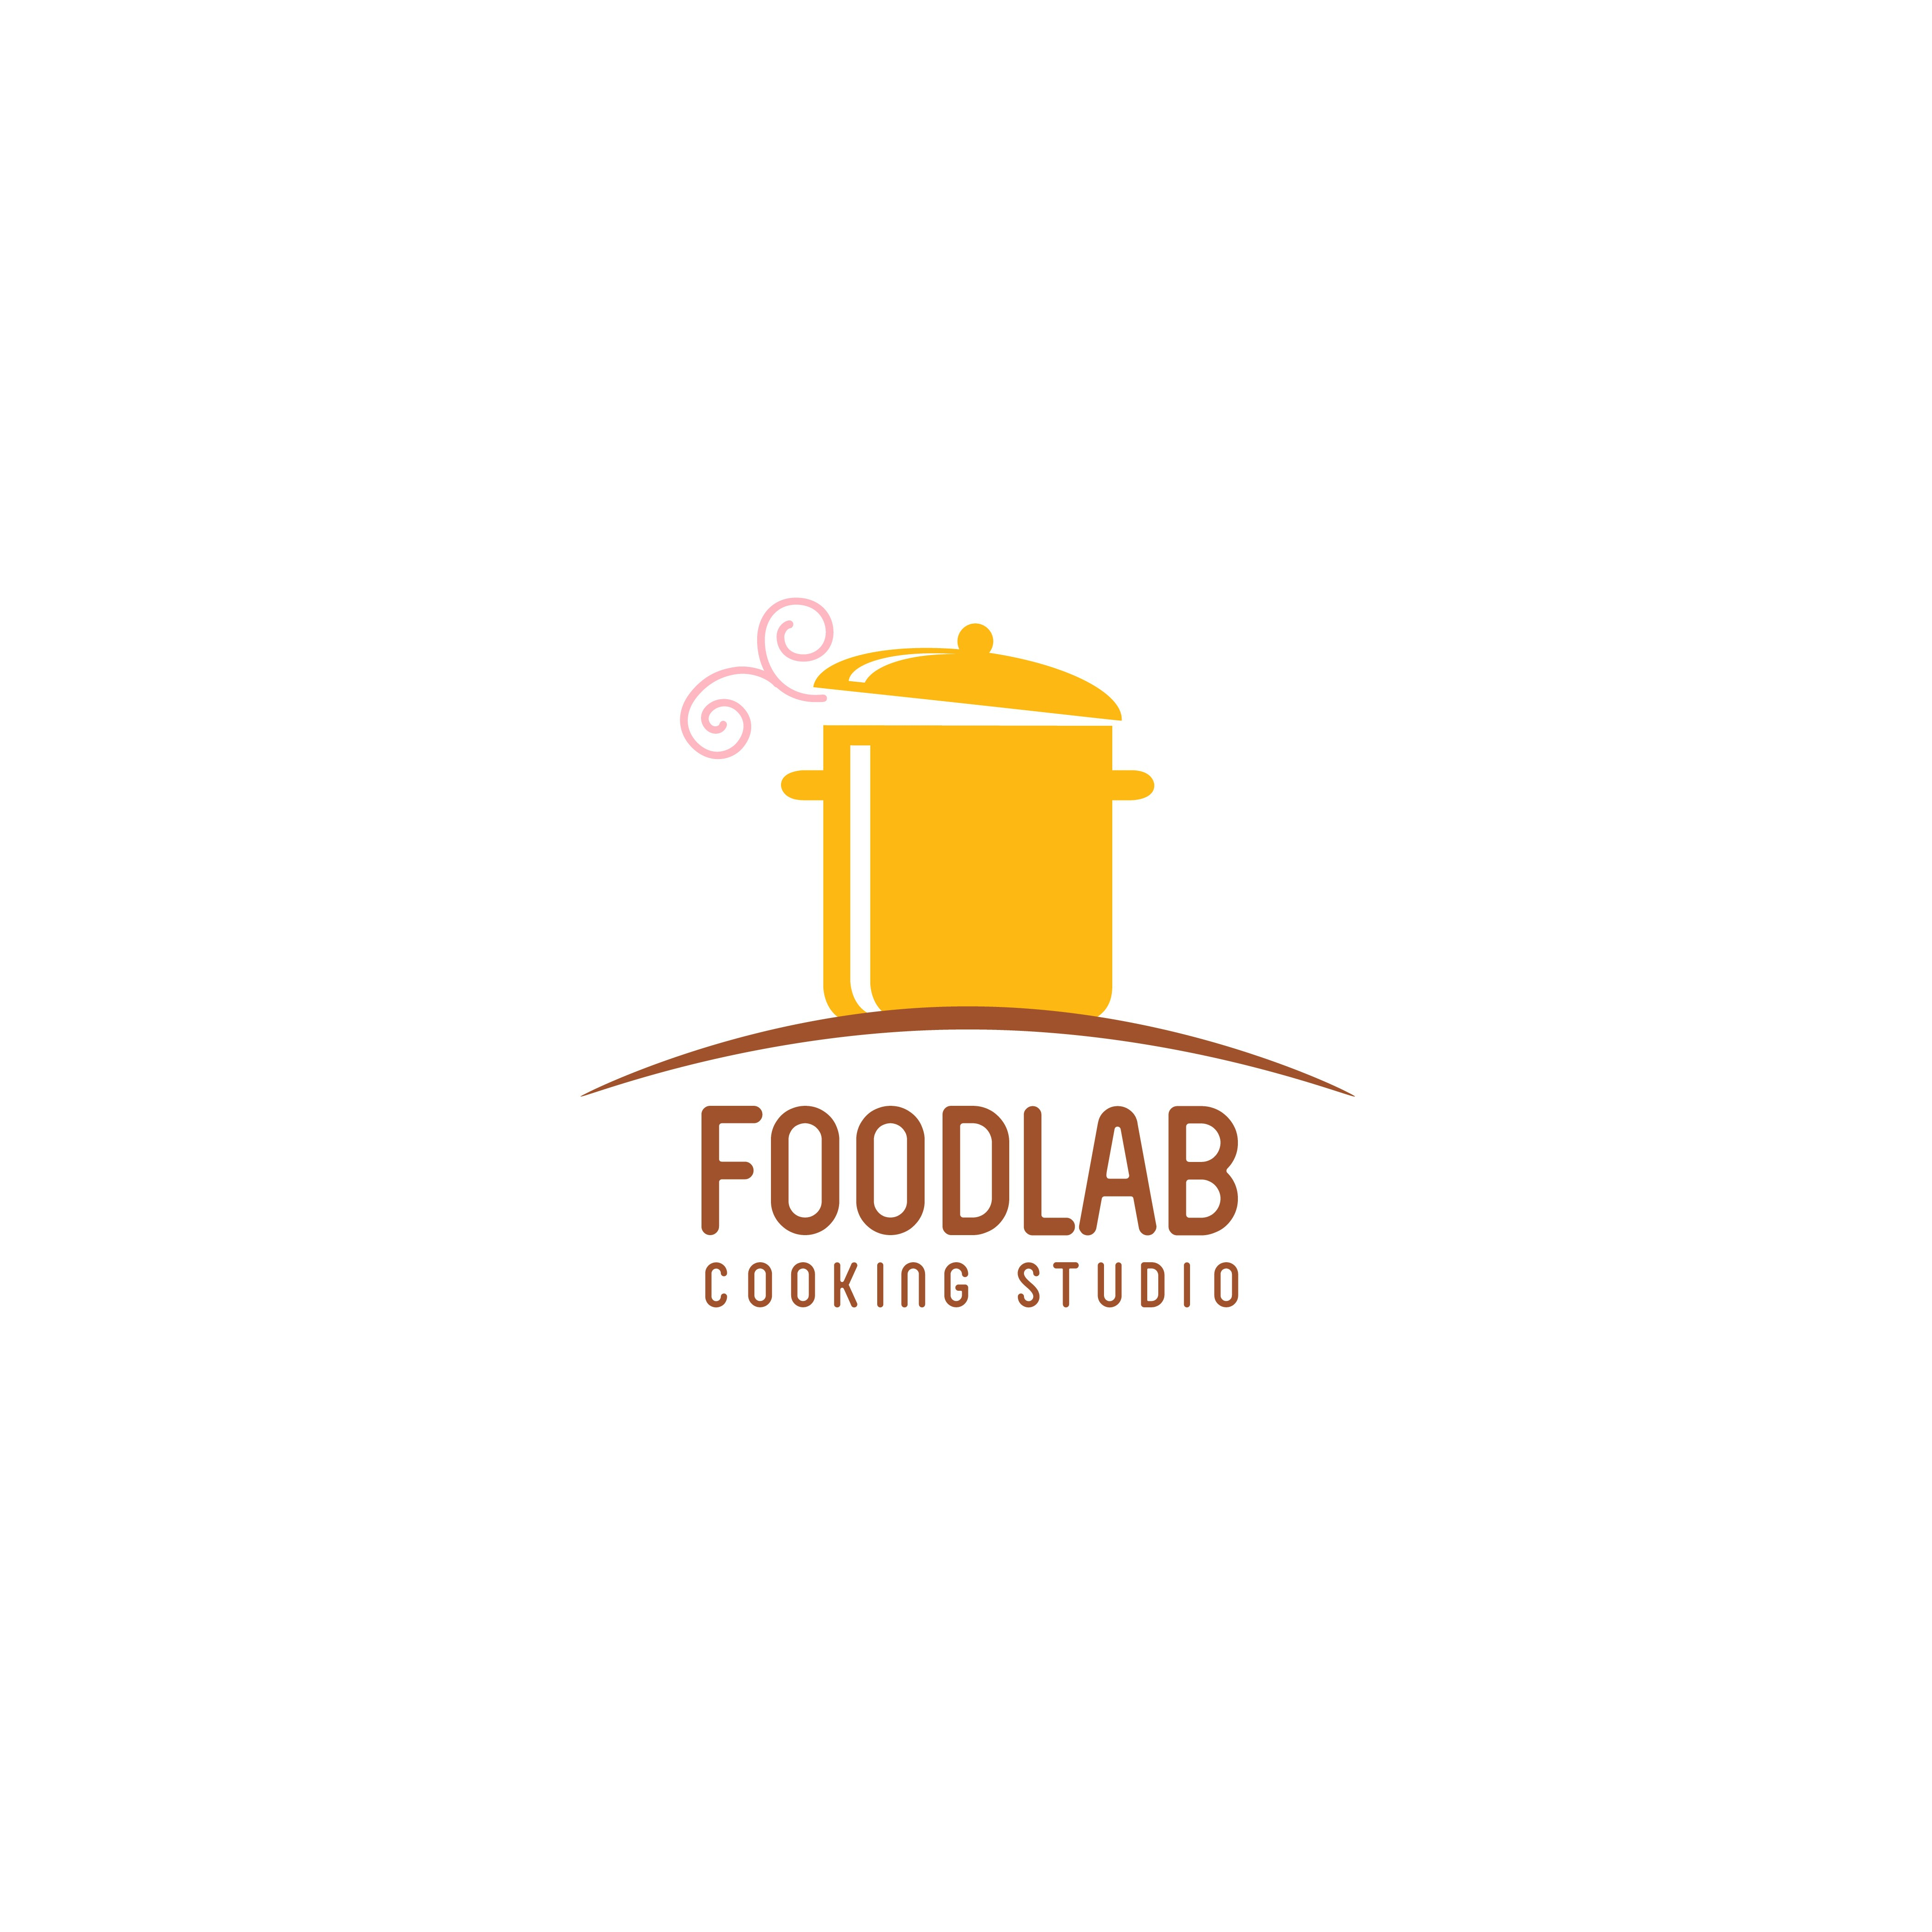 FOODLAB Cooking Studio